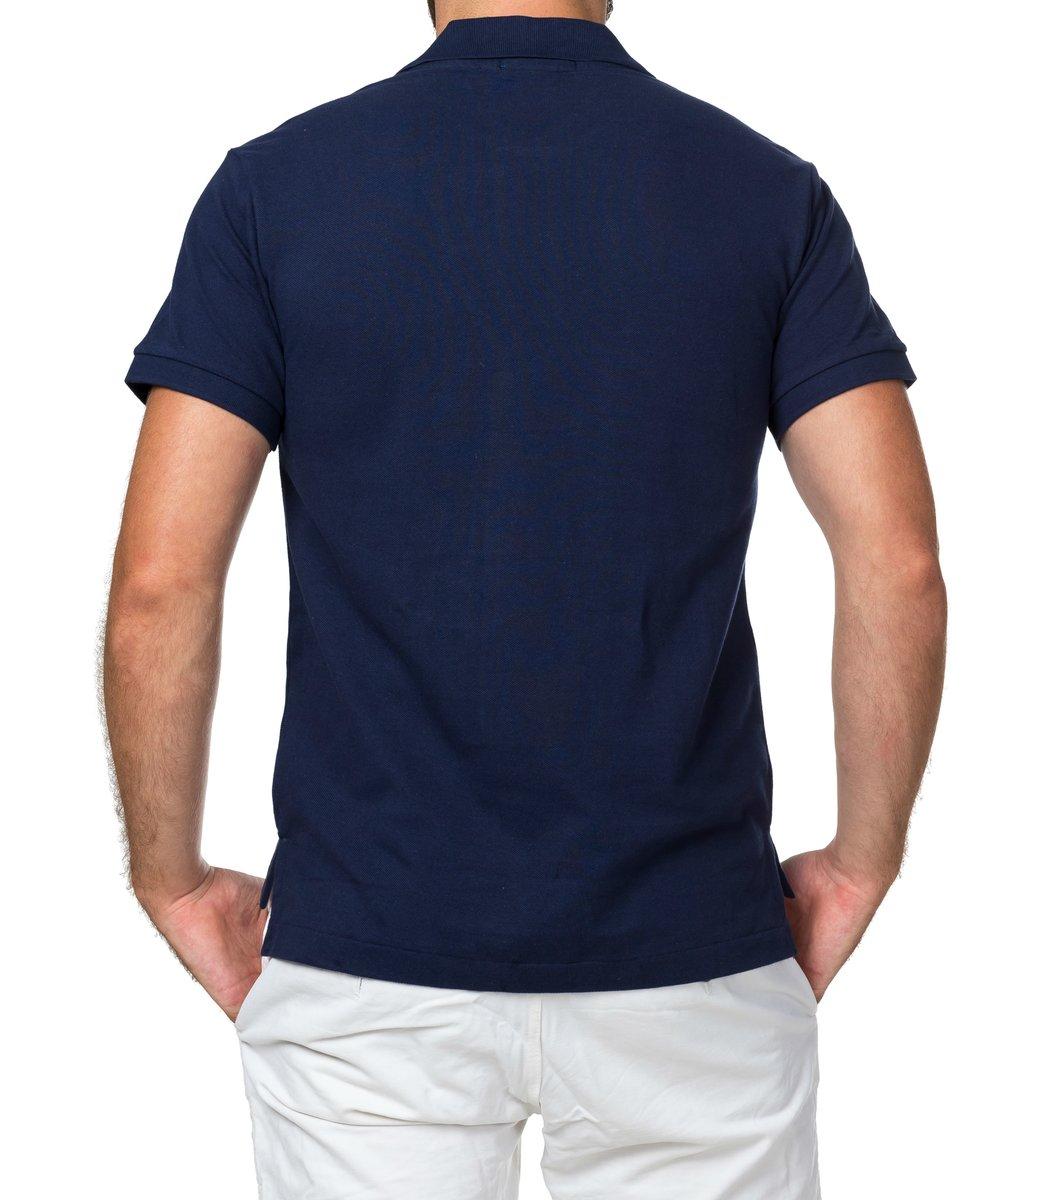 Мужская темно-синяя футболка поло Ralph Lauren R1